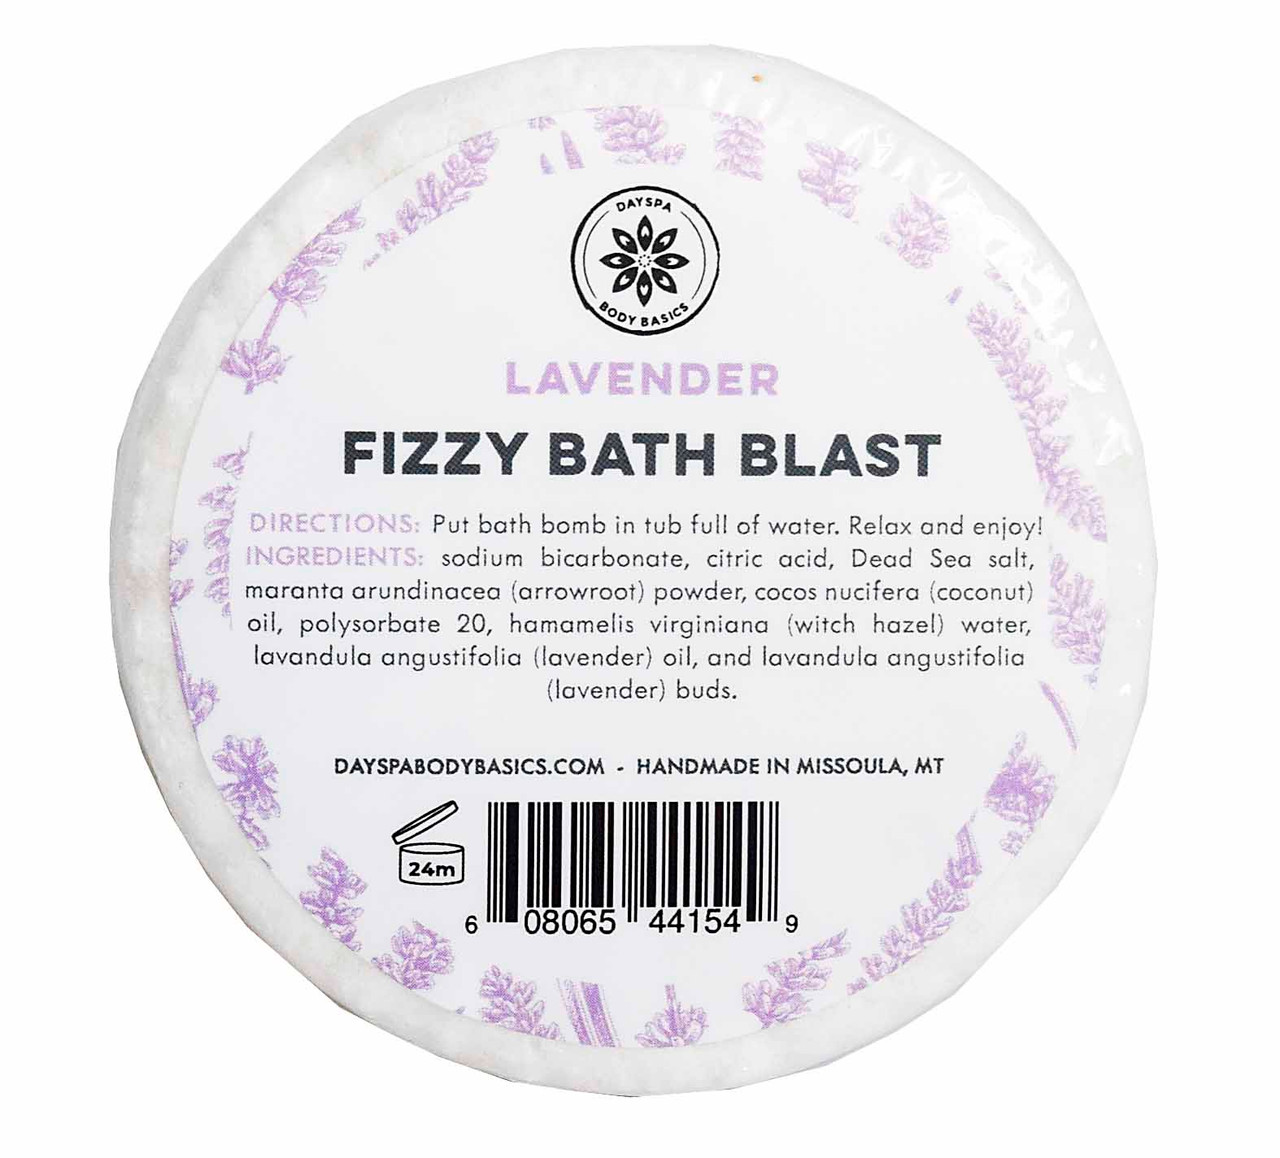 Lavender All-Natural Fizzy Bath Blast - Vegan Bath Bomb